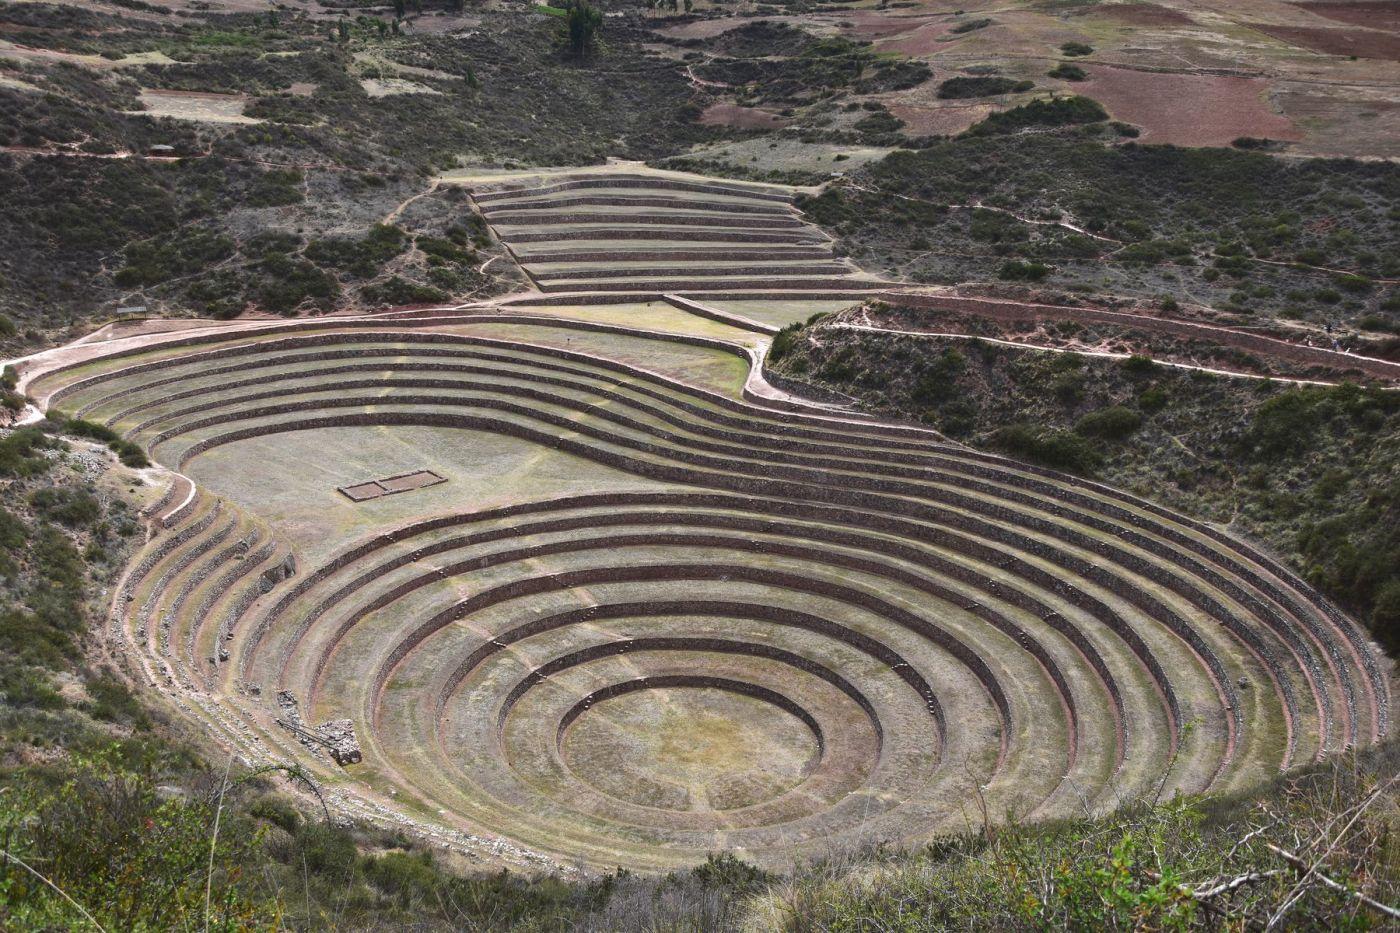 Moray le laboratoire de cultures Inca